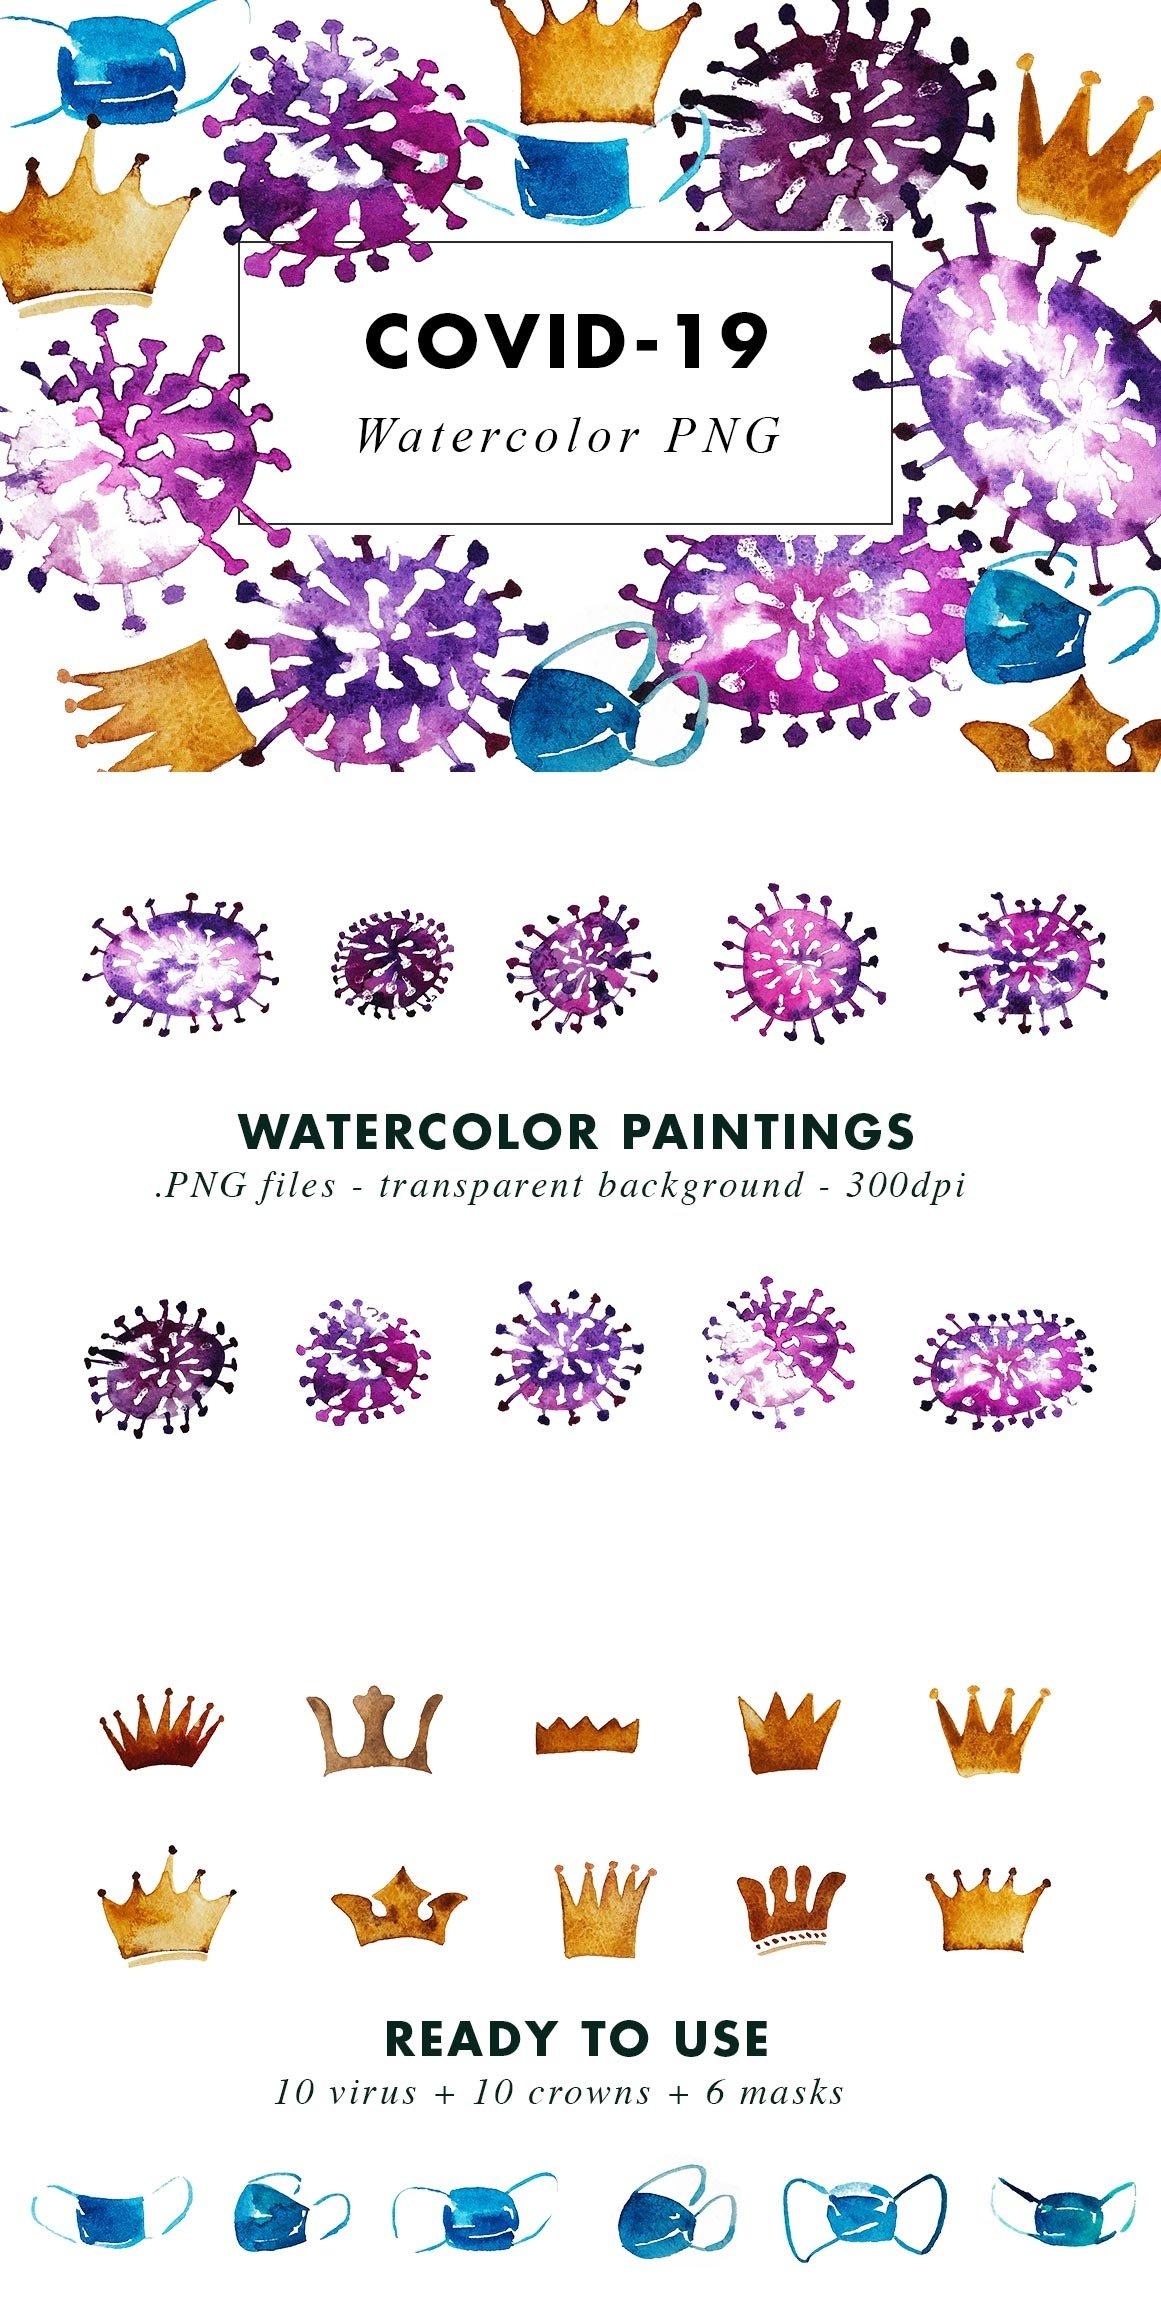 Watercolor Coronavirus Illustrations Covid-19 example image 4